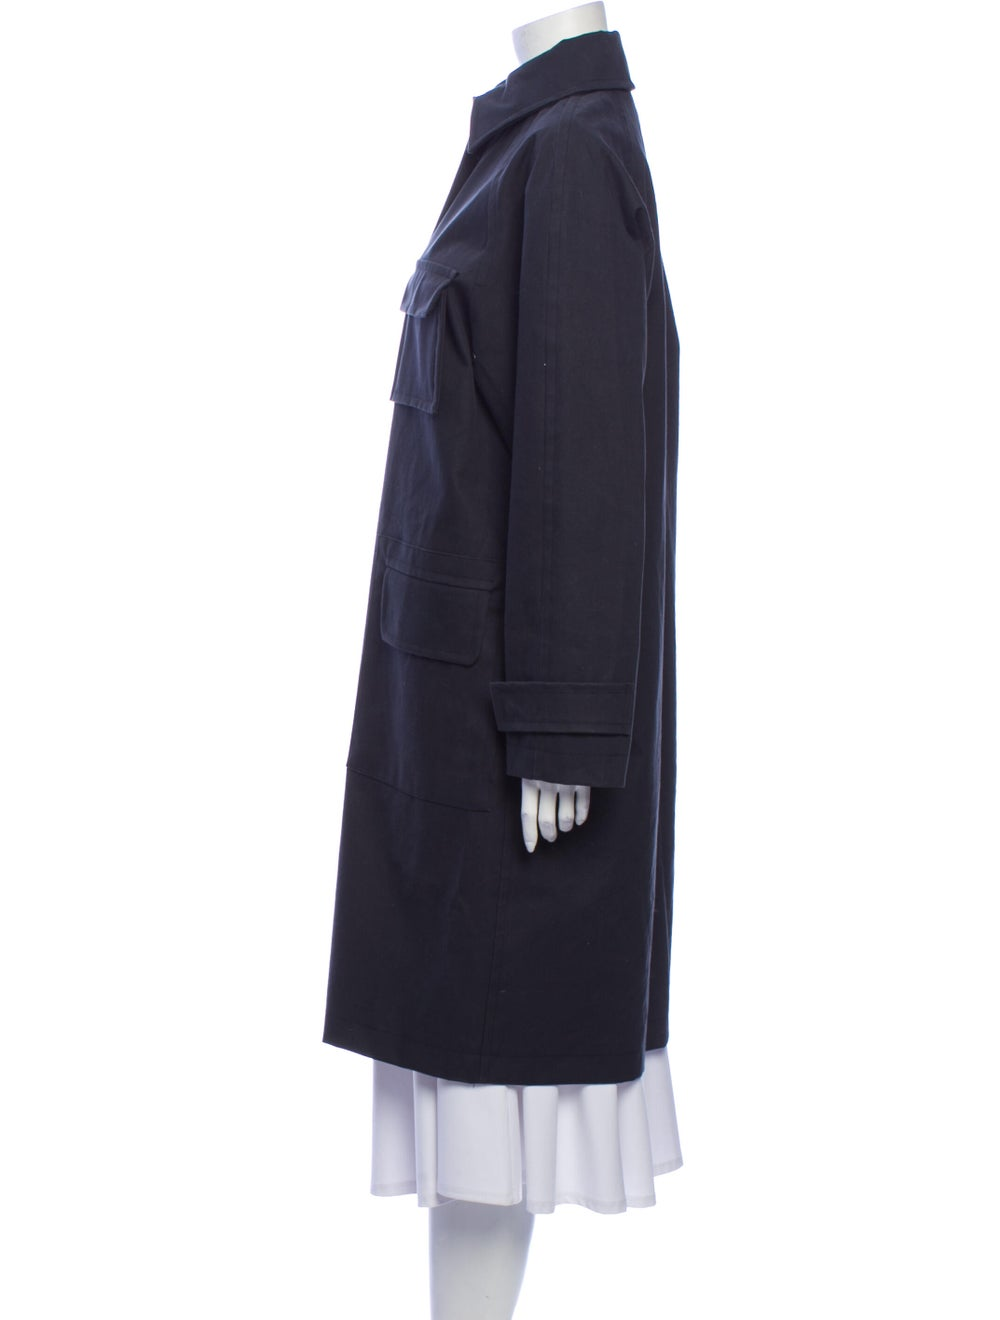 Max Mara Coat Black - image 2